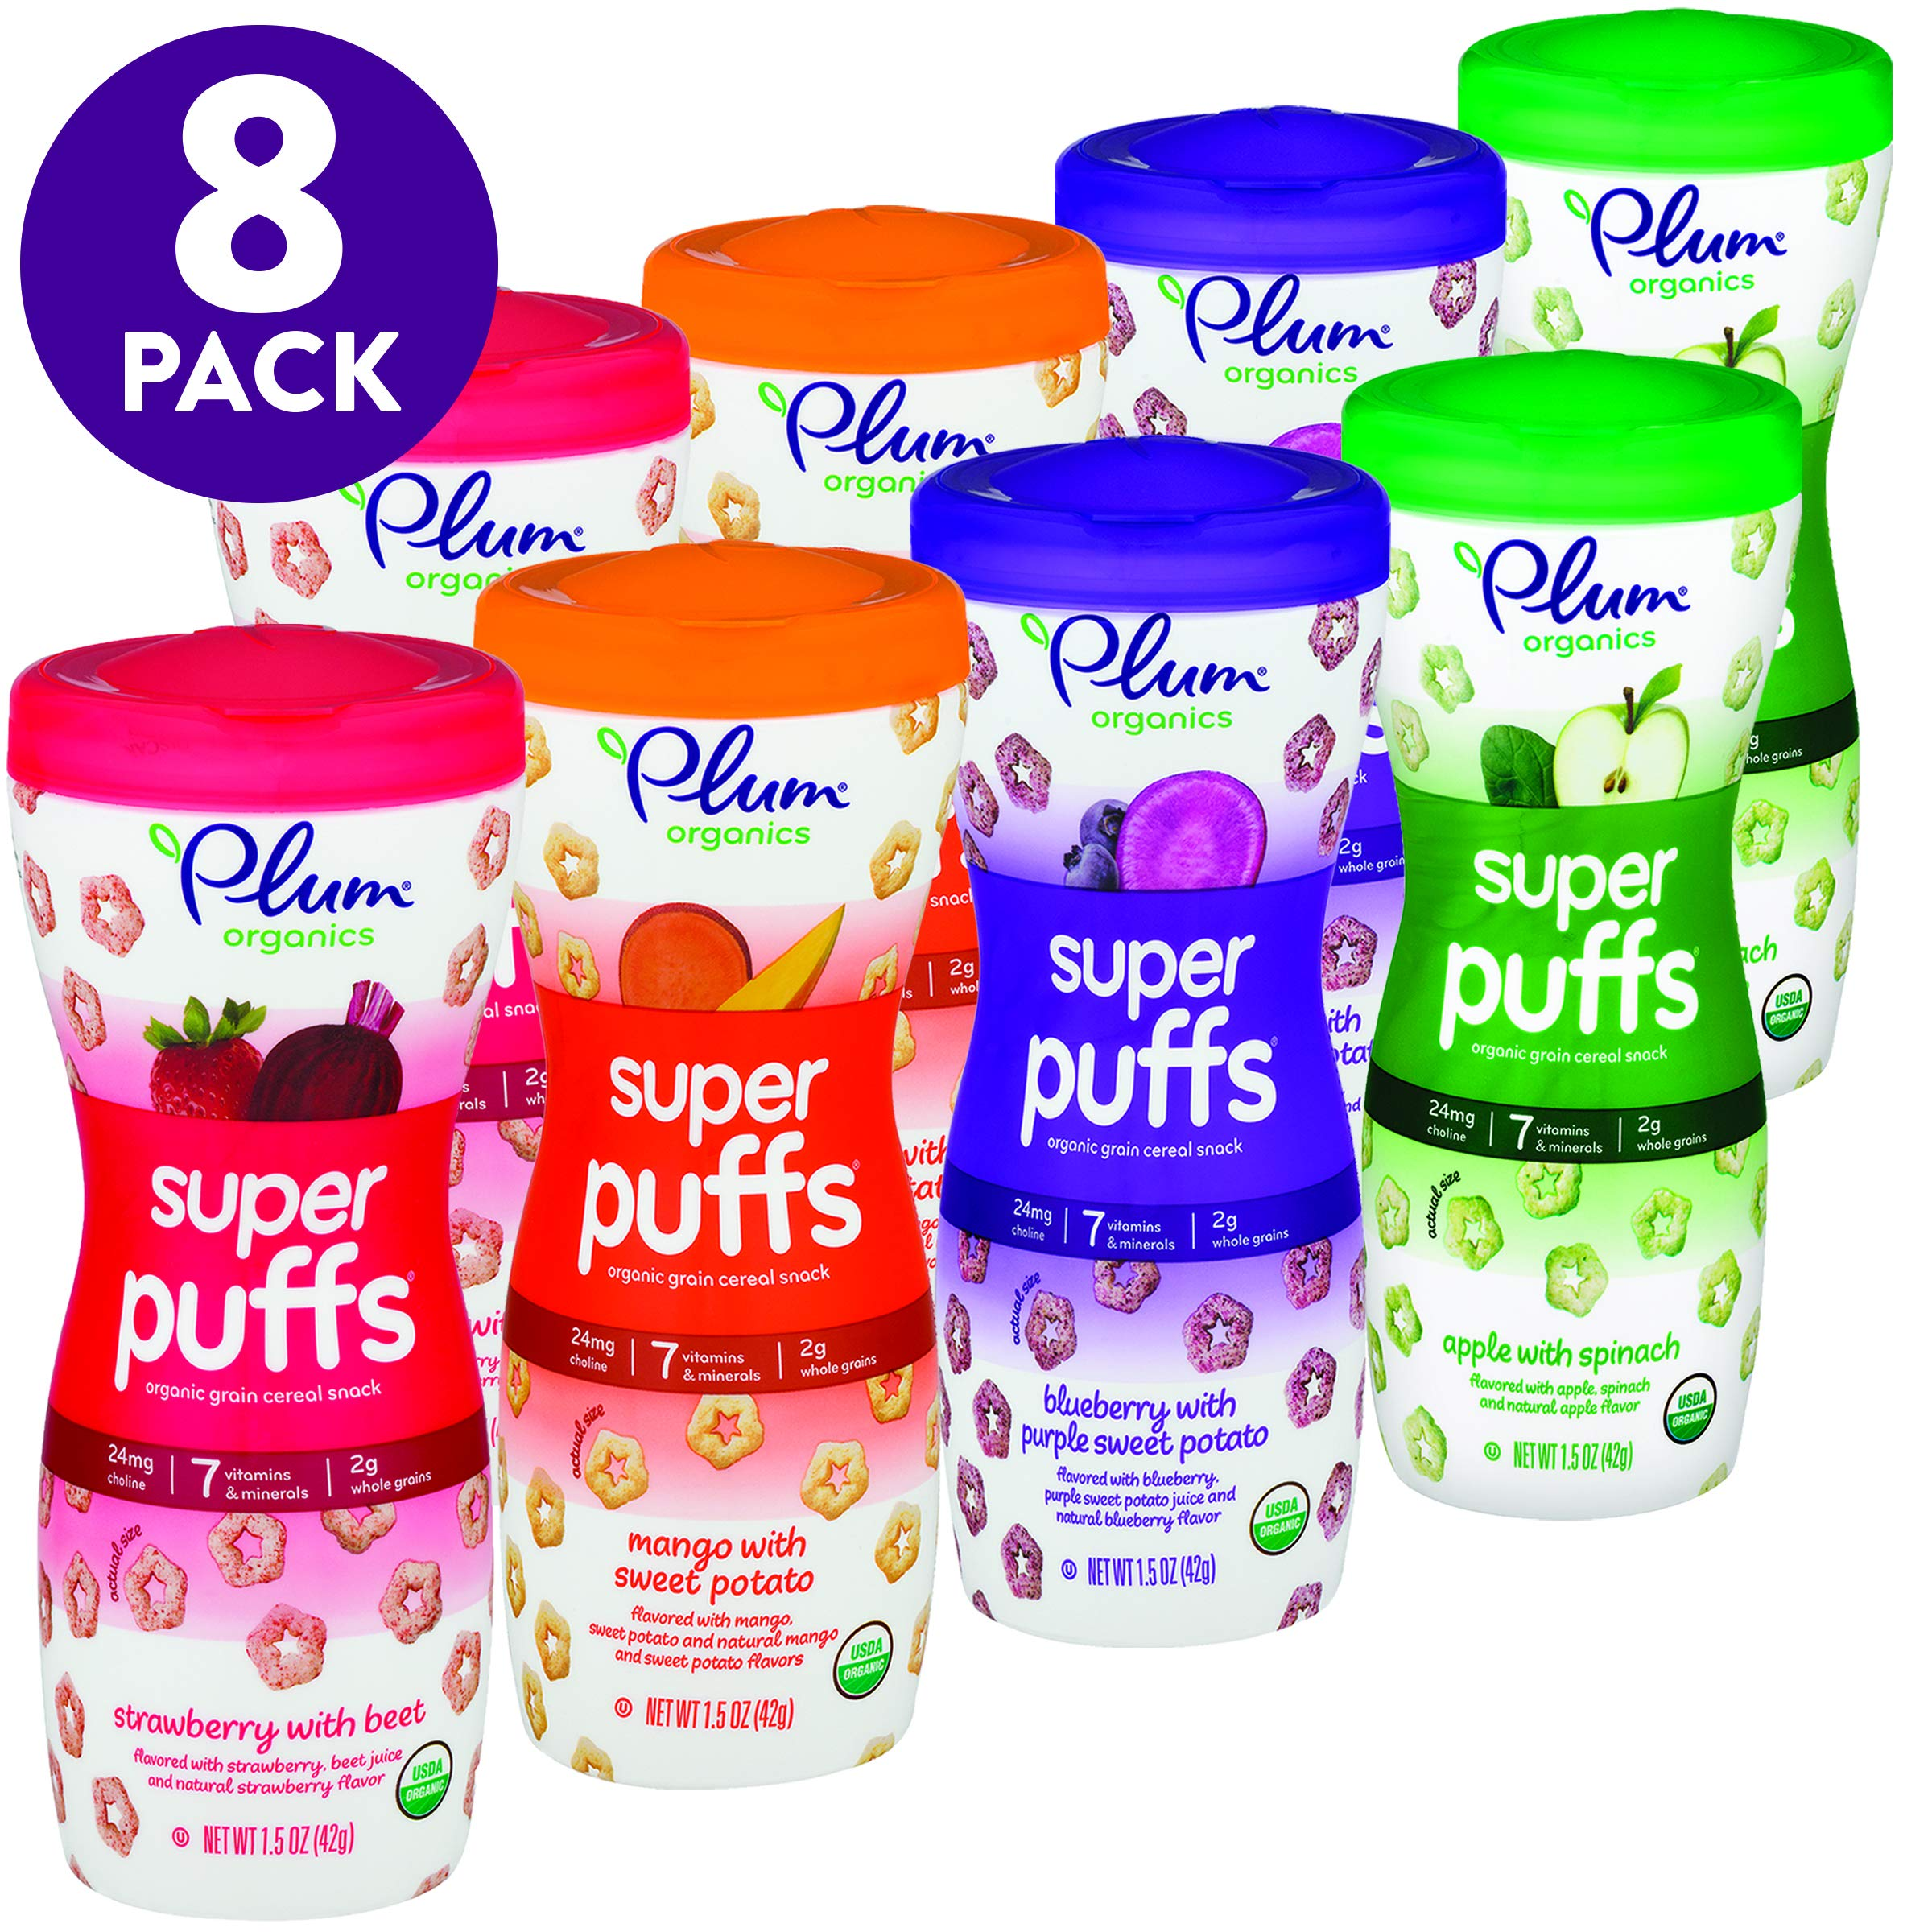 Plum Organics Super Puffs Variety Pack, 1.5 Ounce (Pack of 8) by Plum Organics